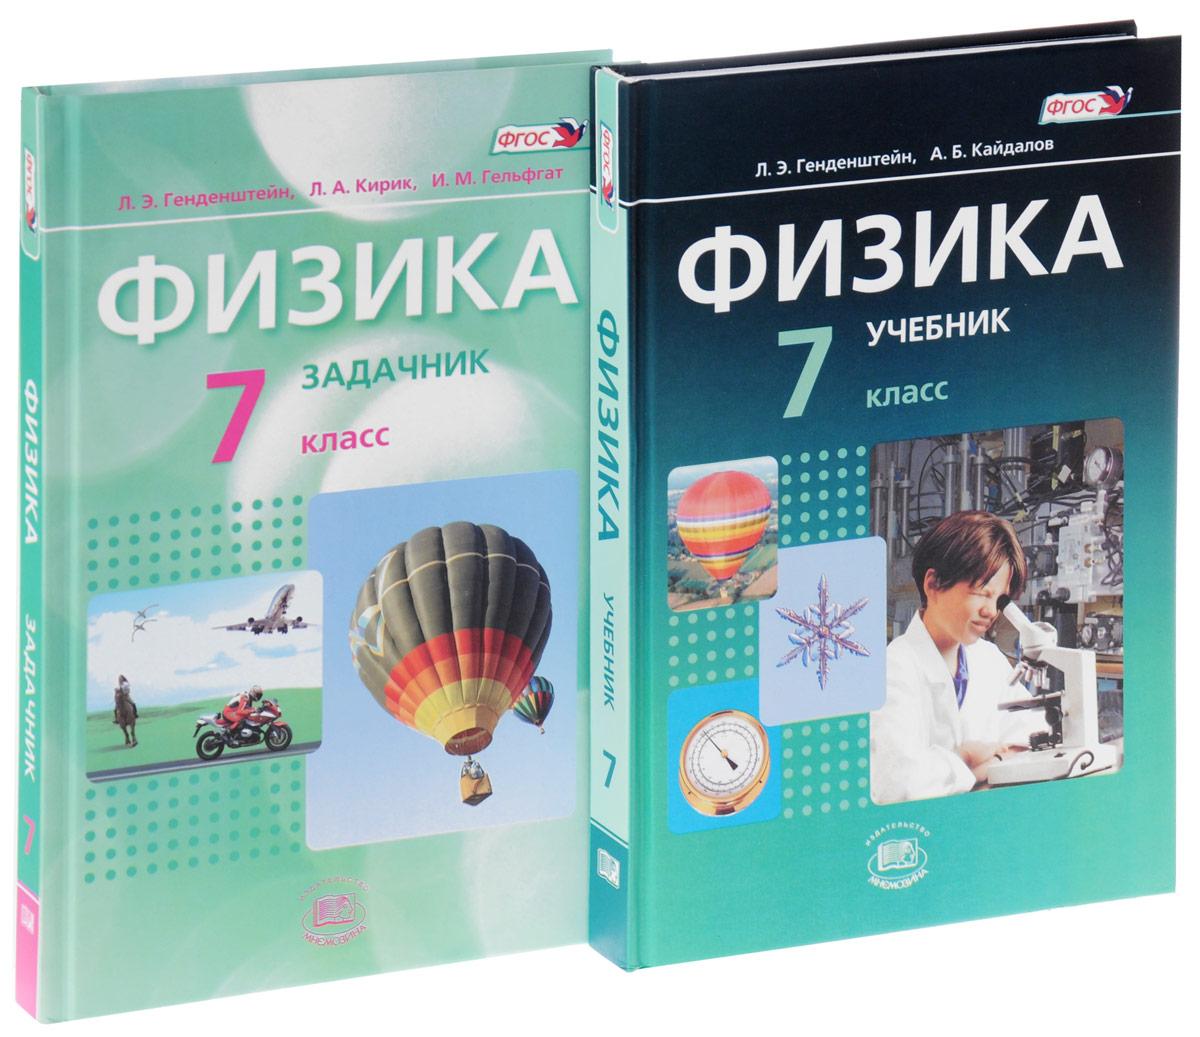 Физика. 7 класс. Учебник. Задачник (комплект из 2 книг)